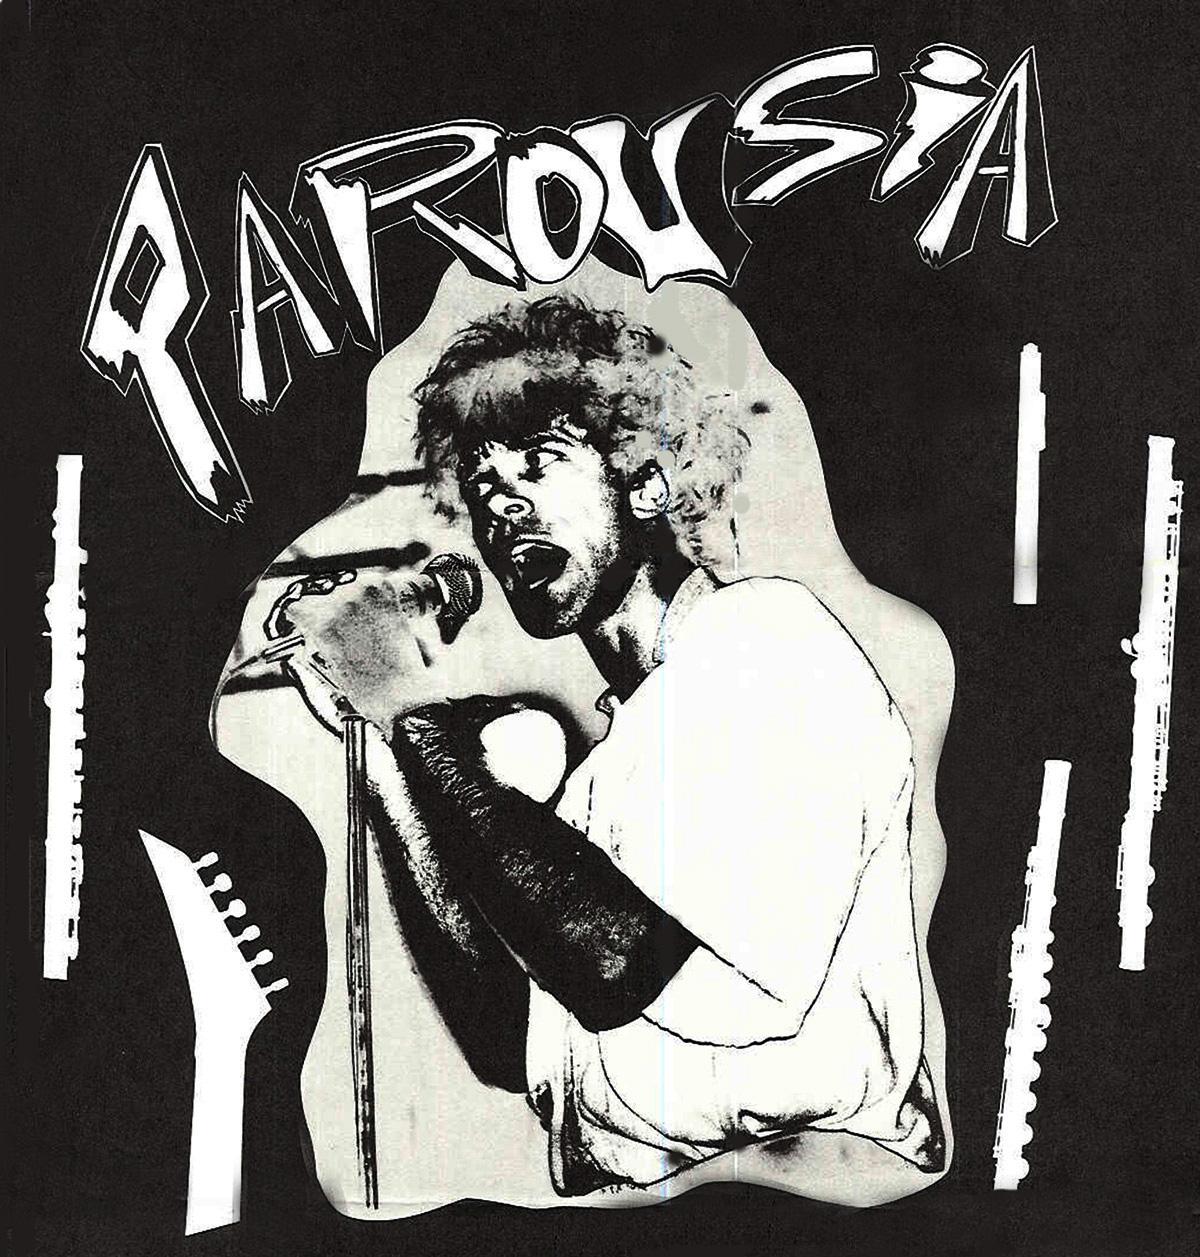 Rock Flute + Rock Guitar + Rockin' Band = PAROUSIA